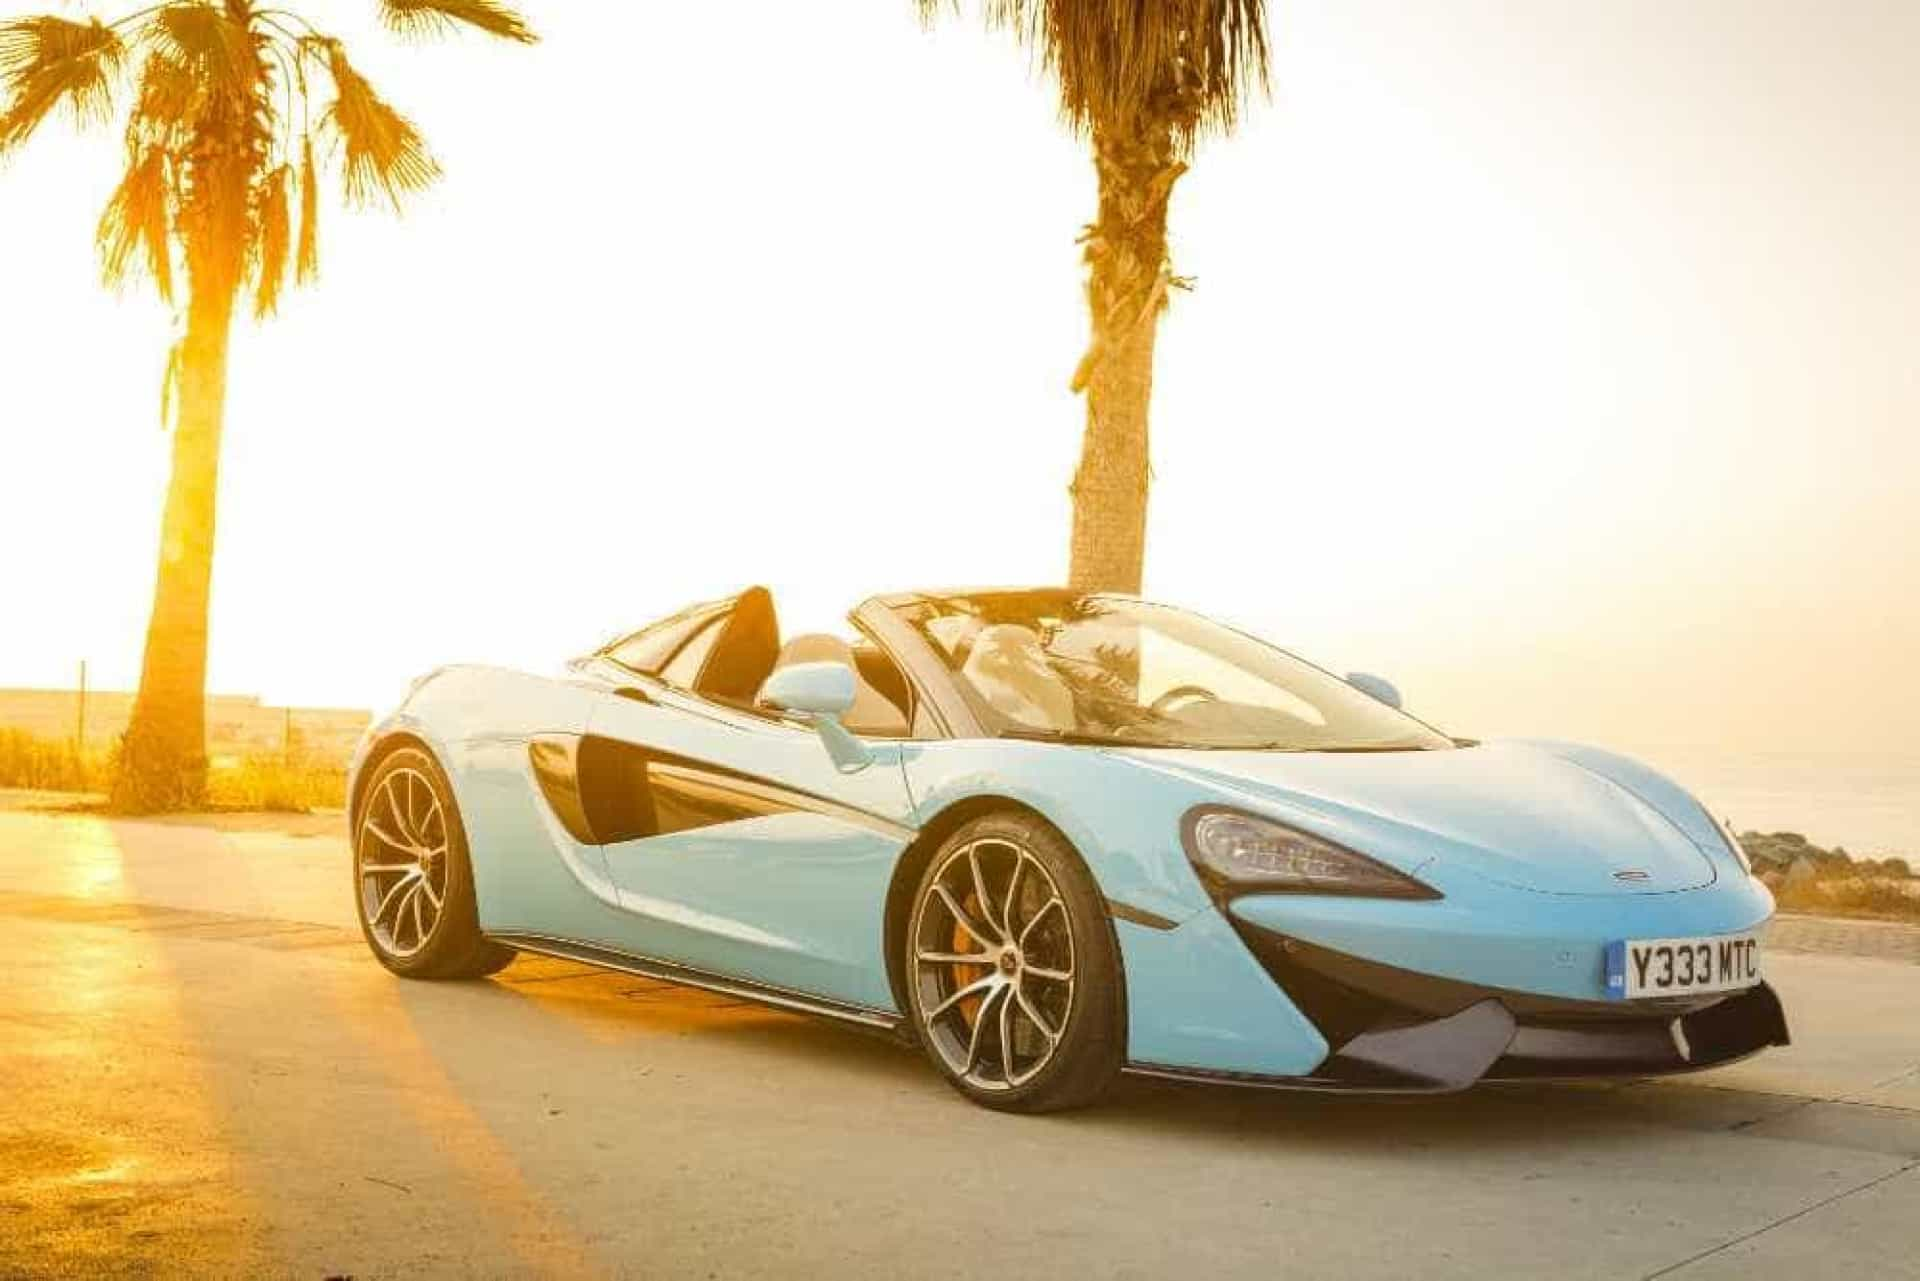 Está aí o McLaren 570S Spider. Já conhece?